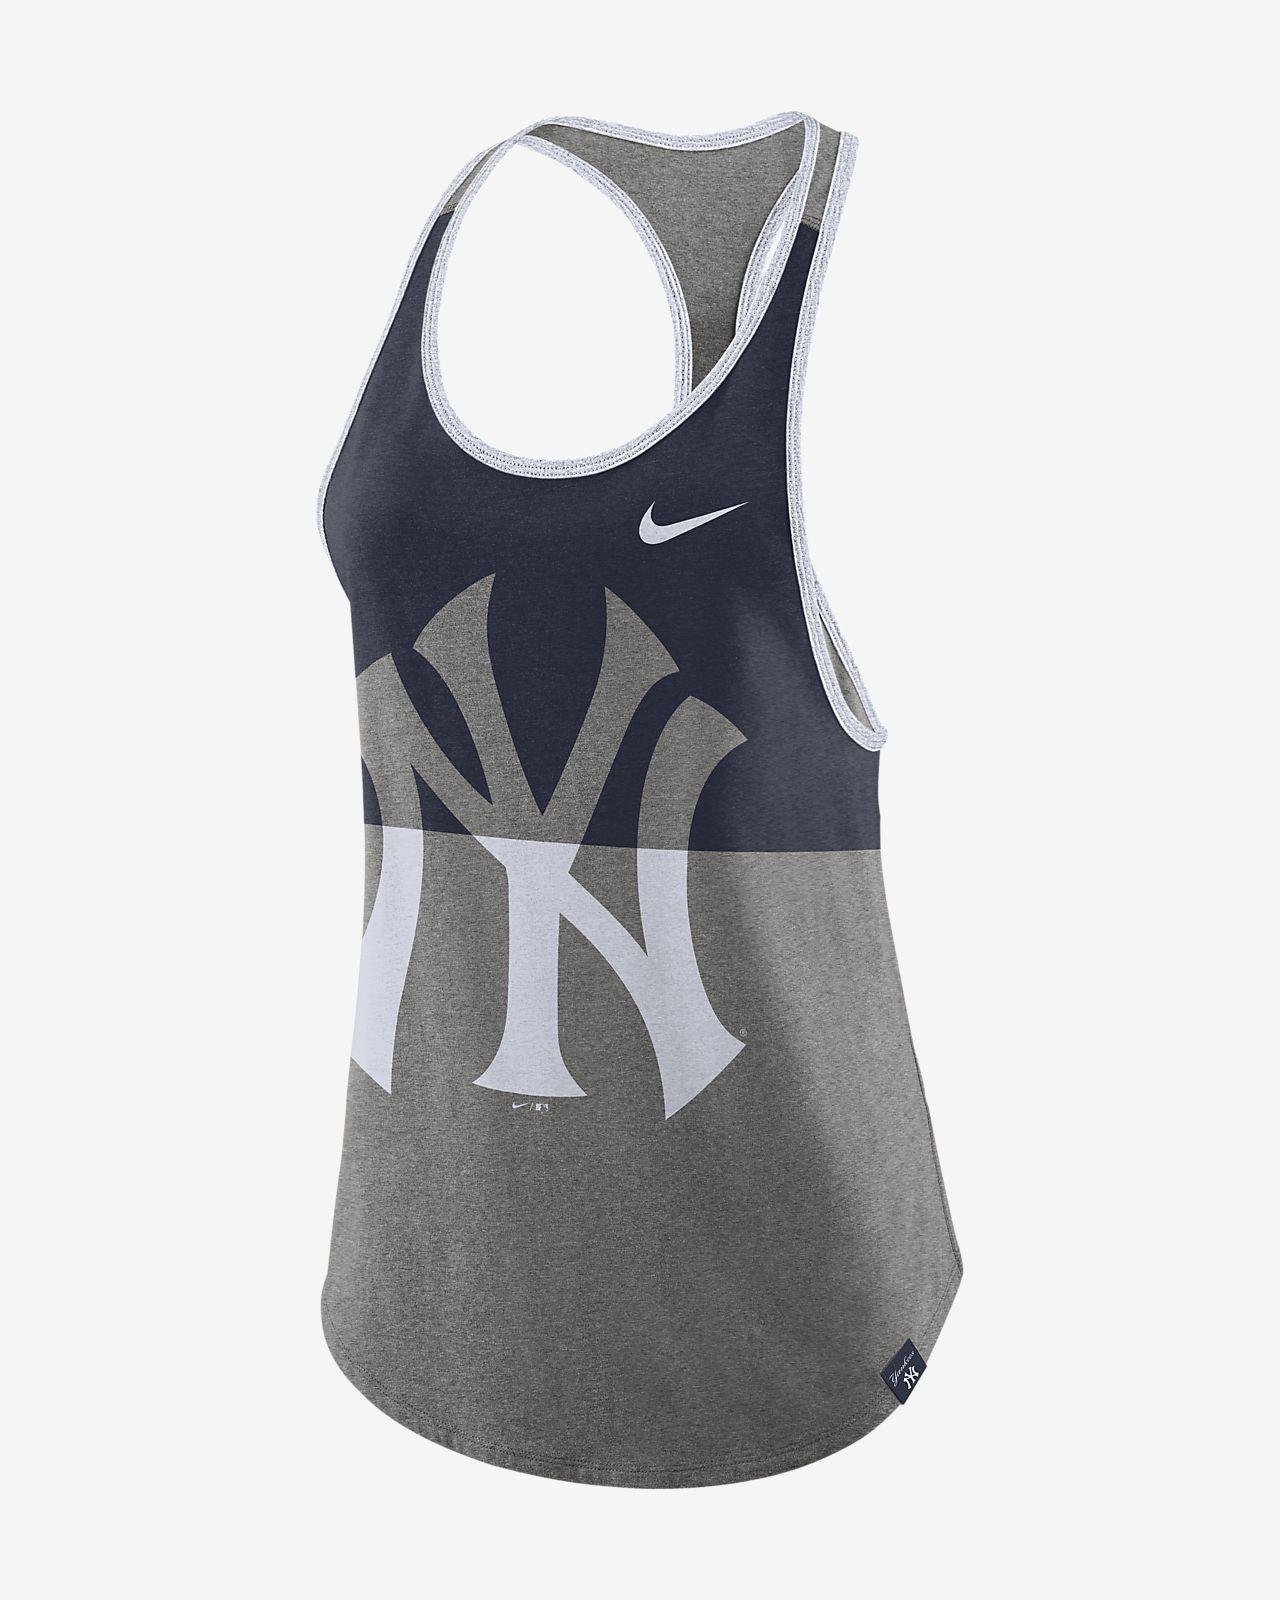 Nike Tri-Blend (MLB Yankees) Women's Tank